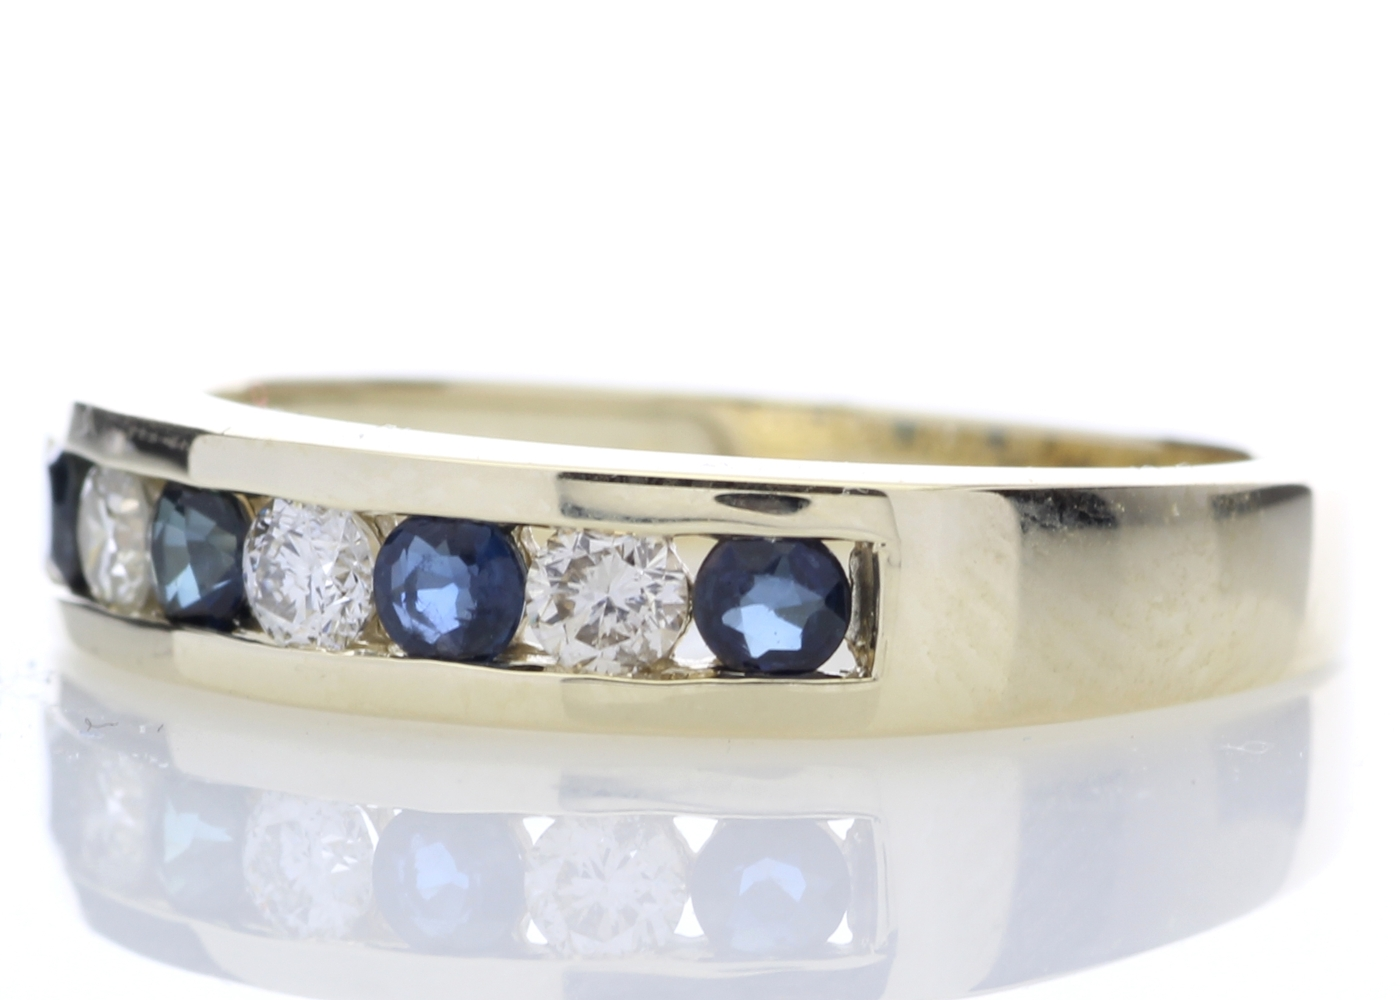 9ct Yellow Gold Channel Set Semi-Eternity Diamond Ring 0.25 Carats - Image 2 of 5